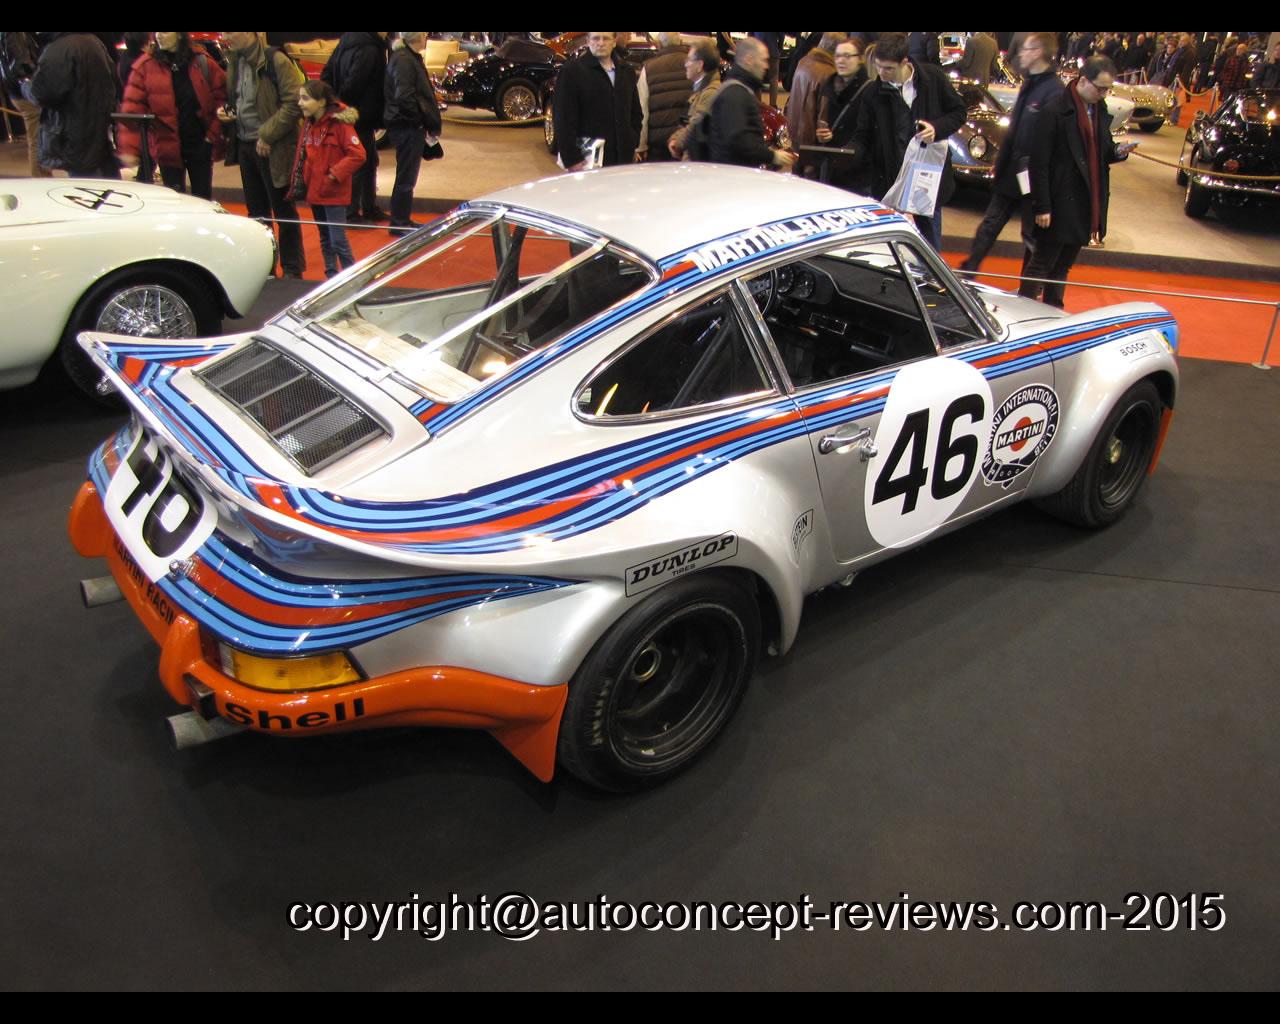 Porsche 911 30 l rsr prototype 1973 porsche 911 30 l rsr prototype 1973 3 vanachro Images